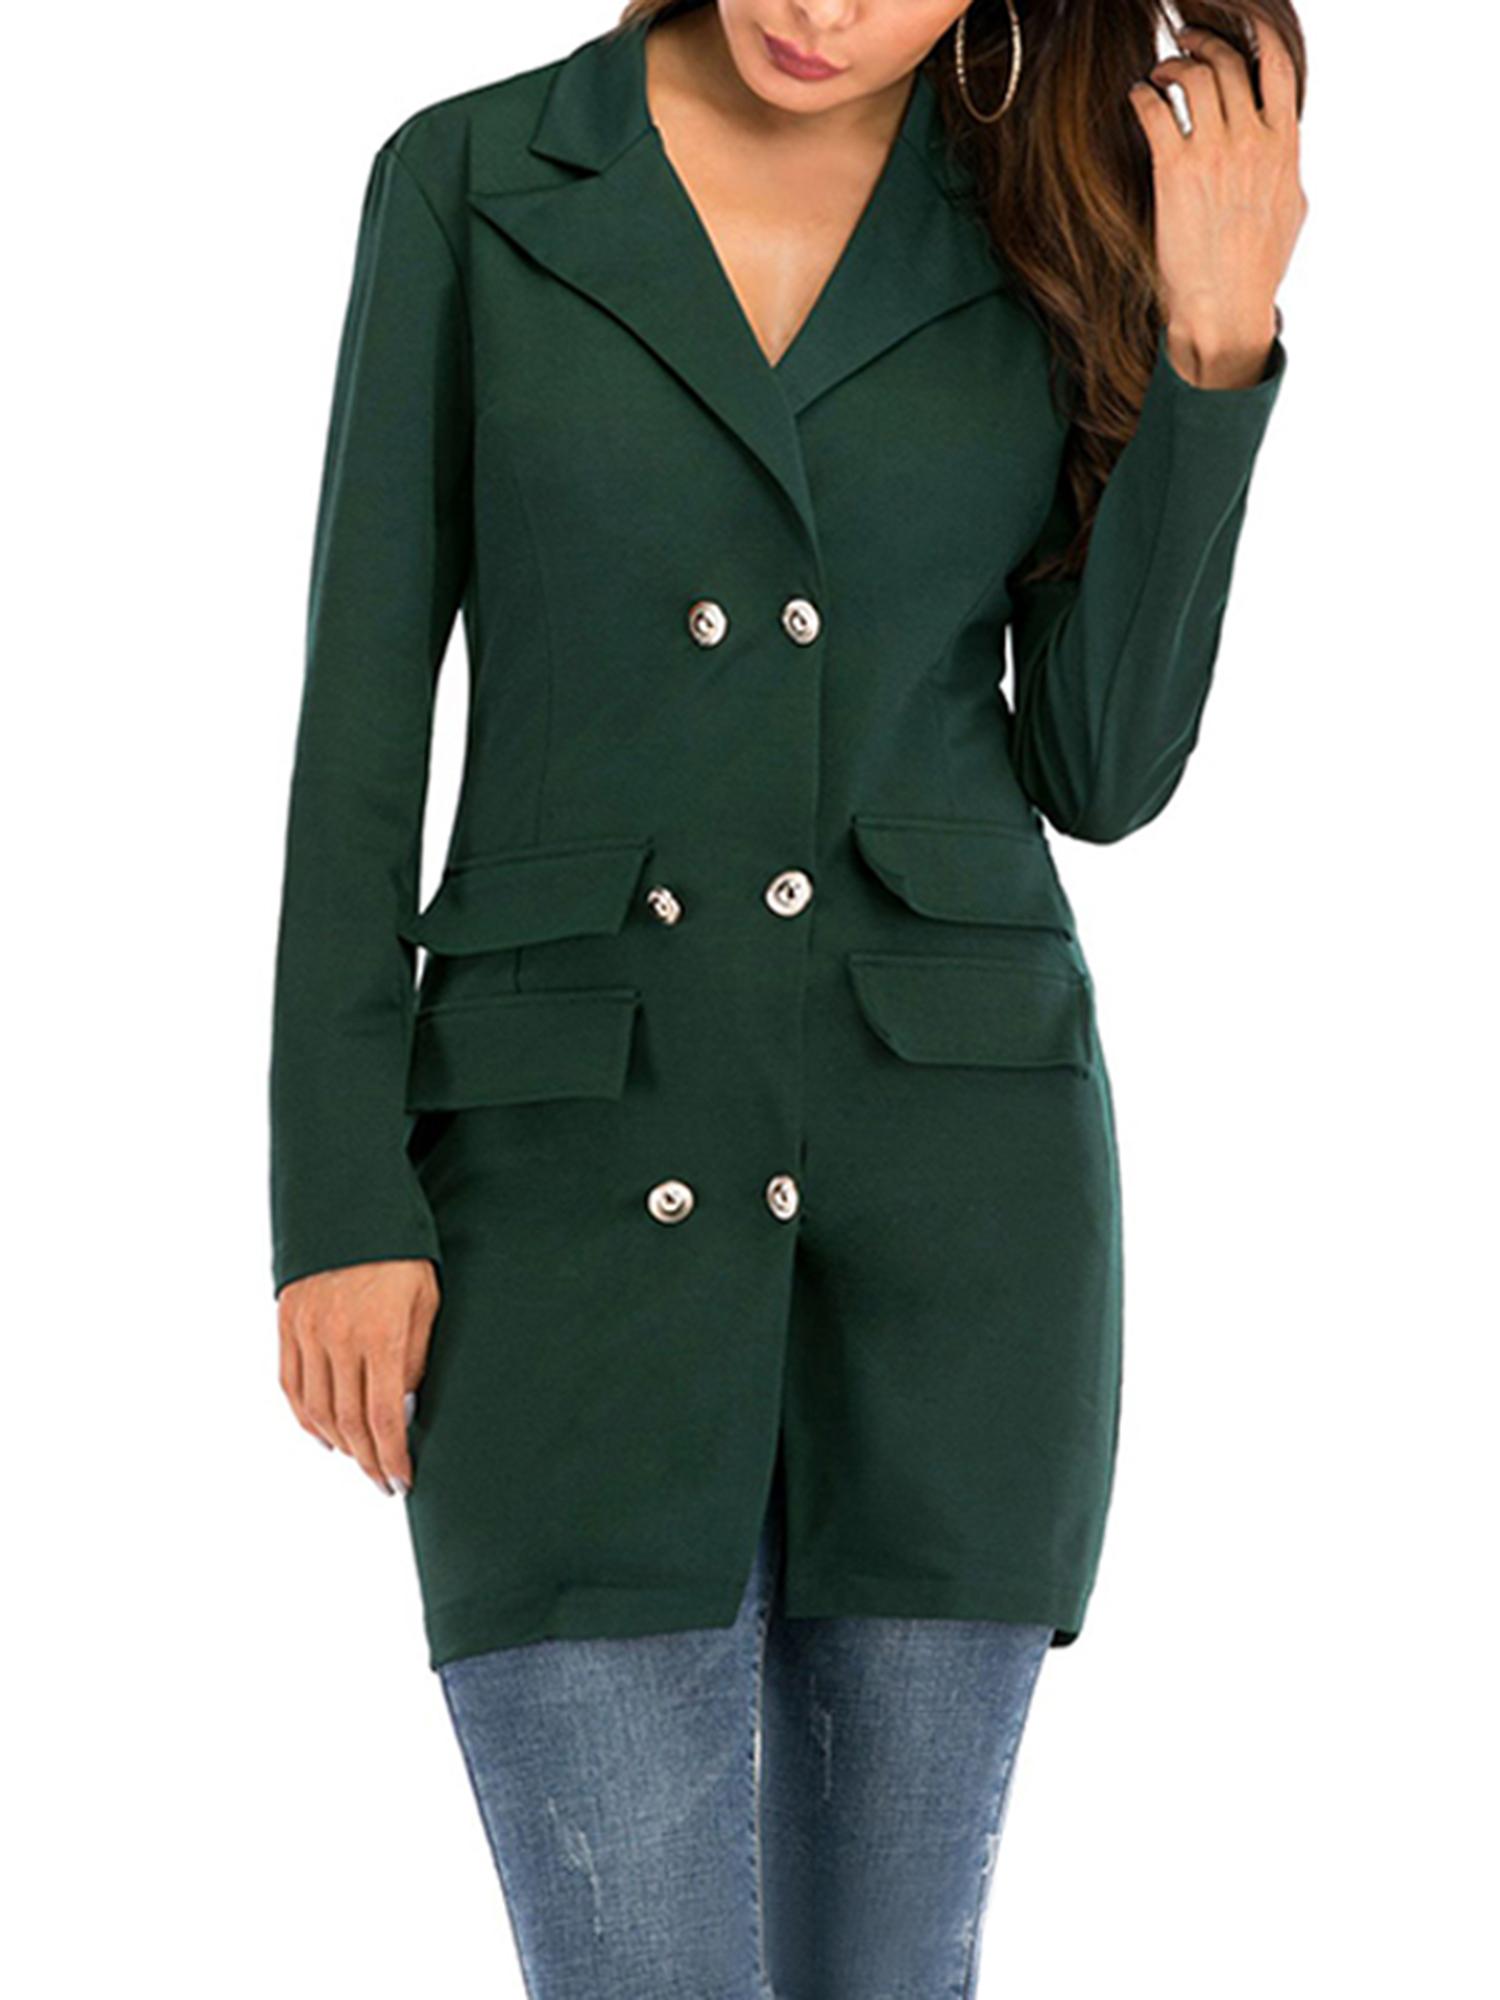 Vintage-Women-Double-Breasted-Plaid-Long-Blazer-Ladies-Jackets-Suits-Coat-Pocket miniatura 27